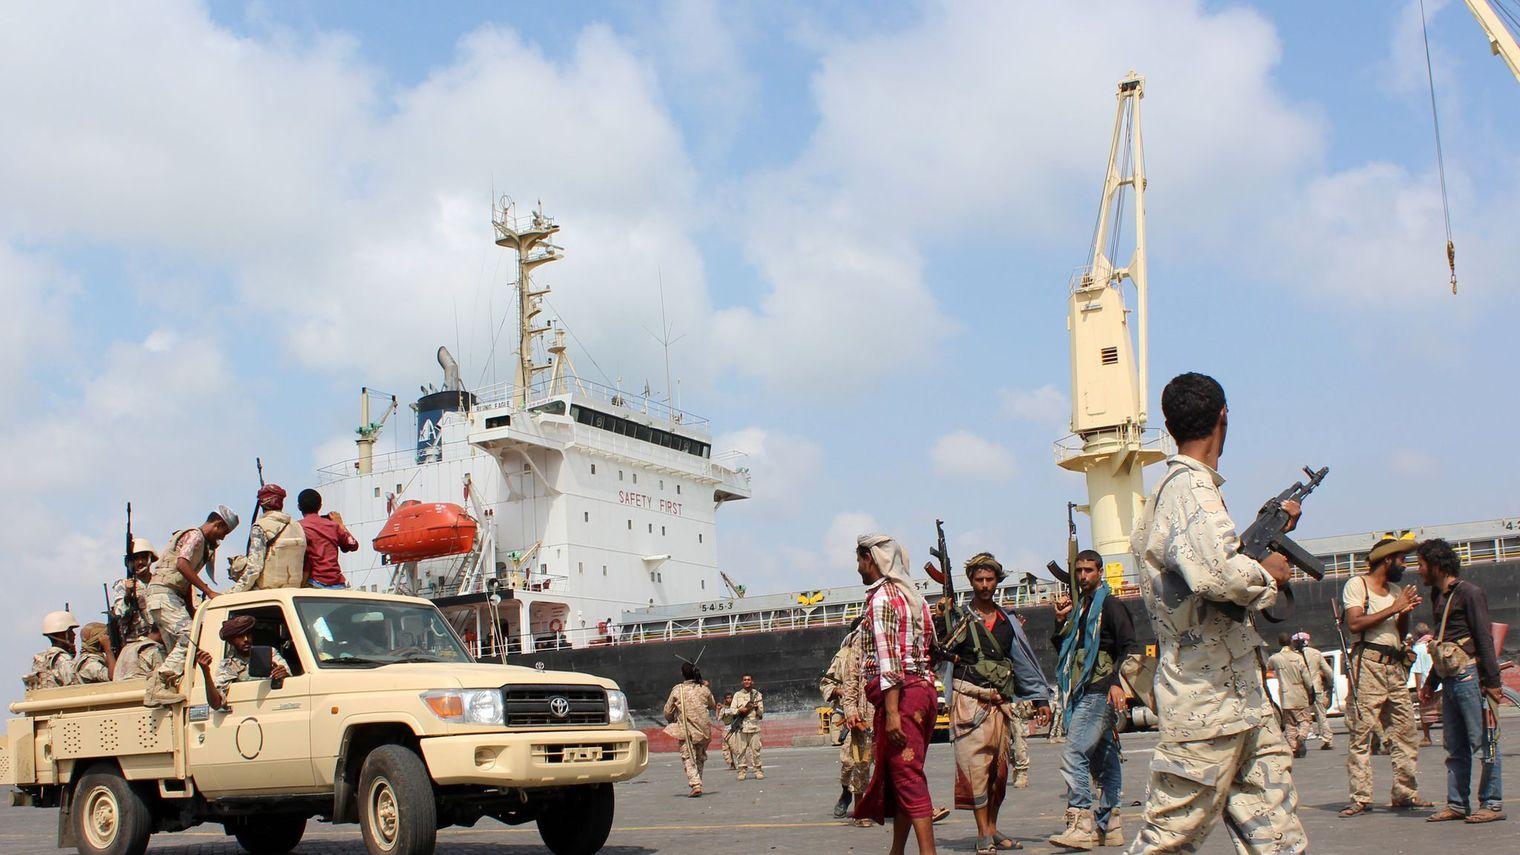 Cinq policiers tués dans  une attaque attribuée  à Al-Qaïda  au Yémen